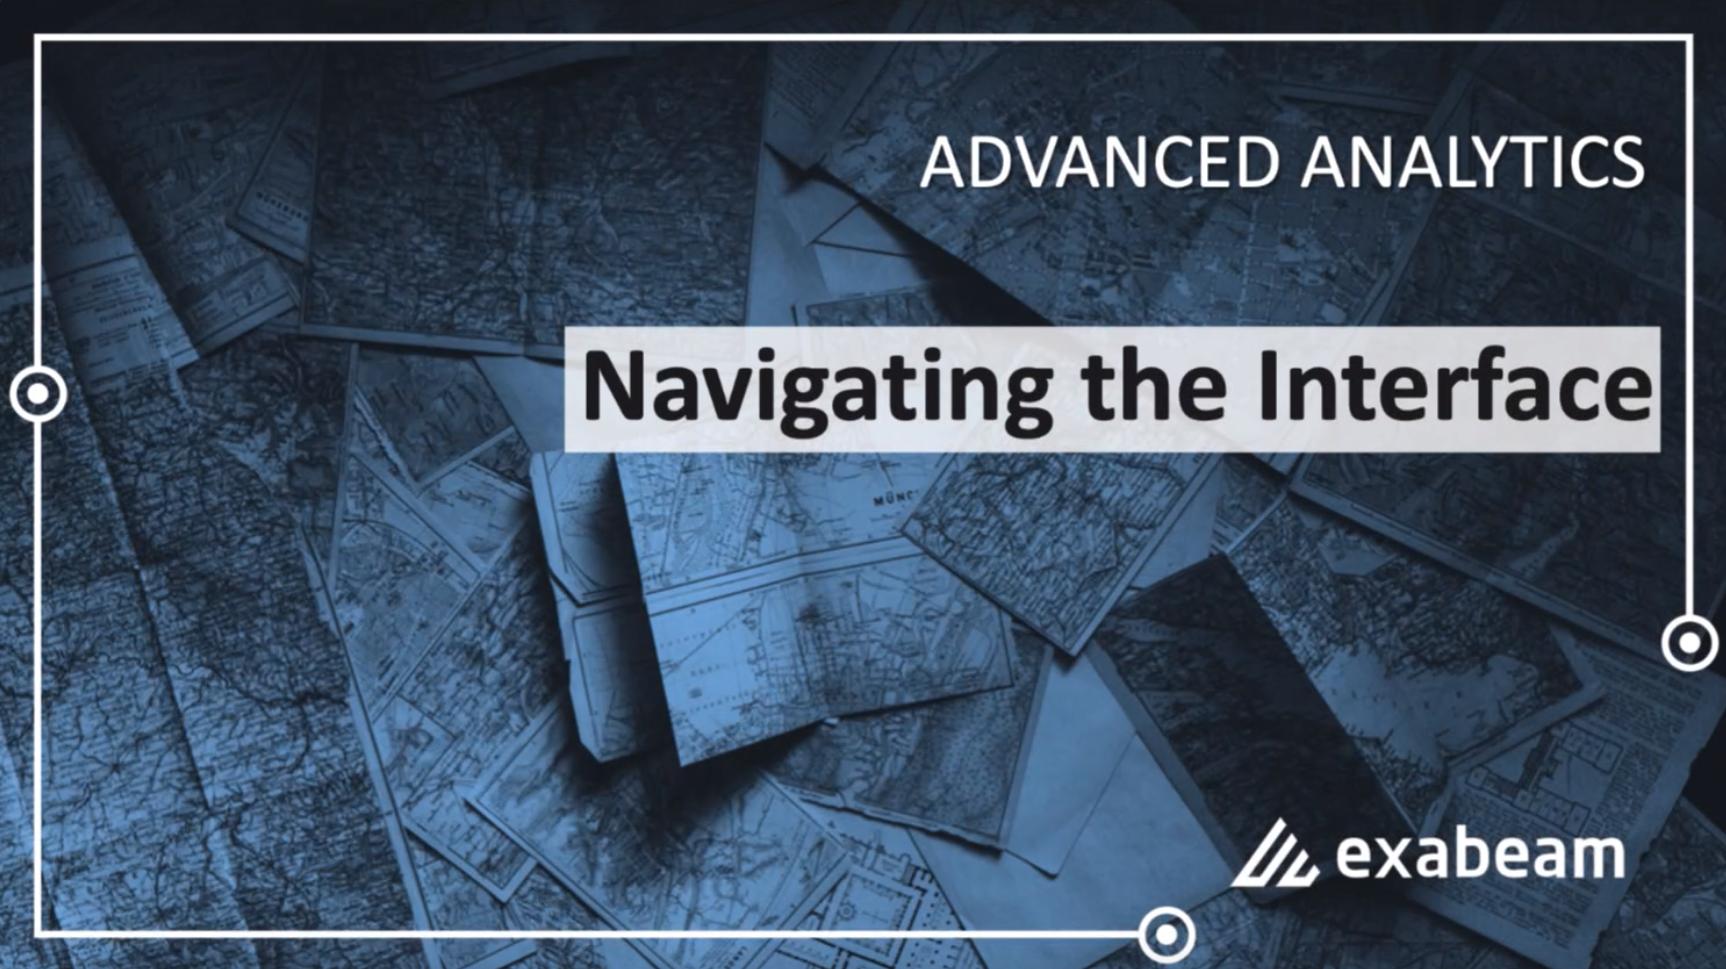 Episode 1: Navigating the Advanced Analytics Interface